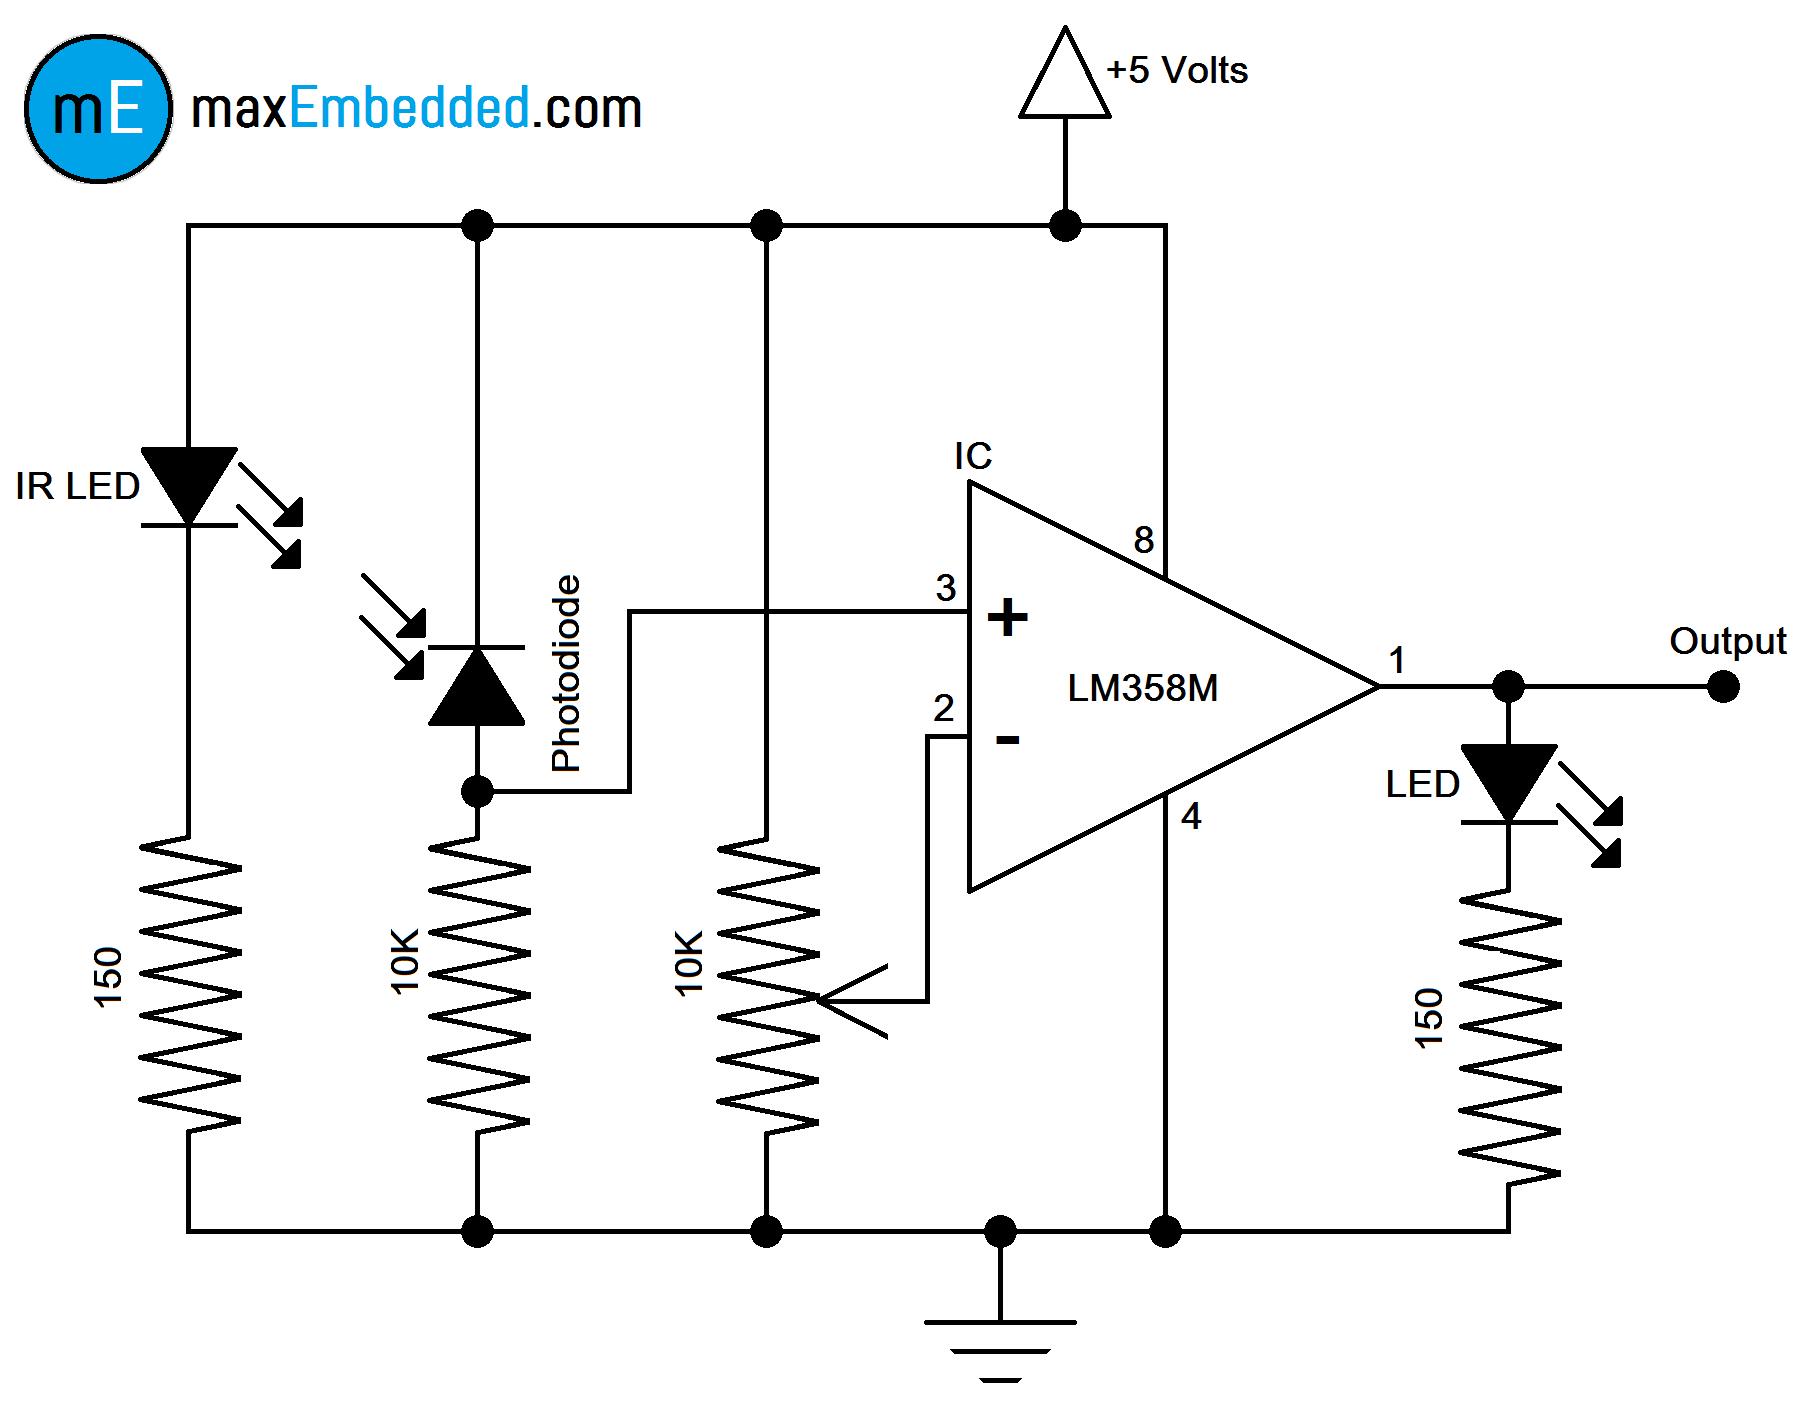 small resolution of ir sensor circuit schematic wiring diagram online simple ir proximity sensor circuit diagram how to build